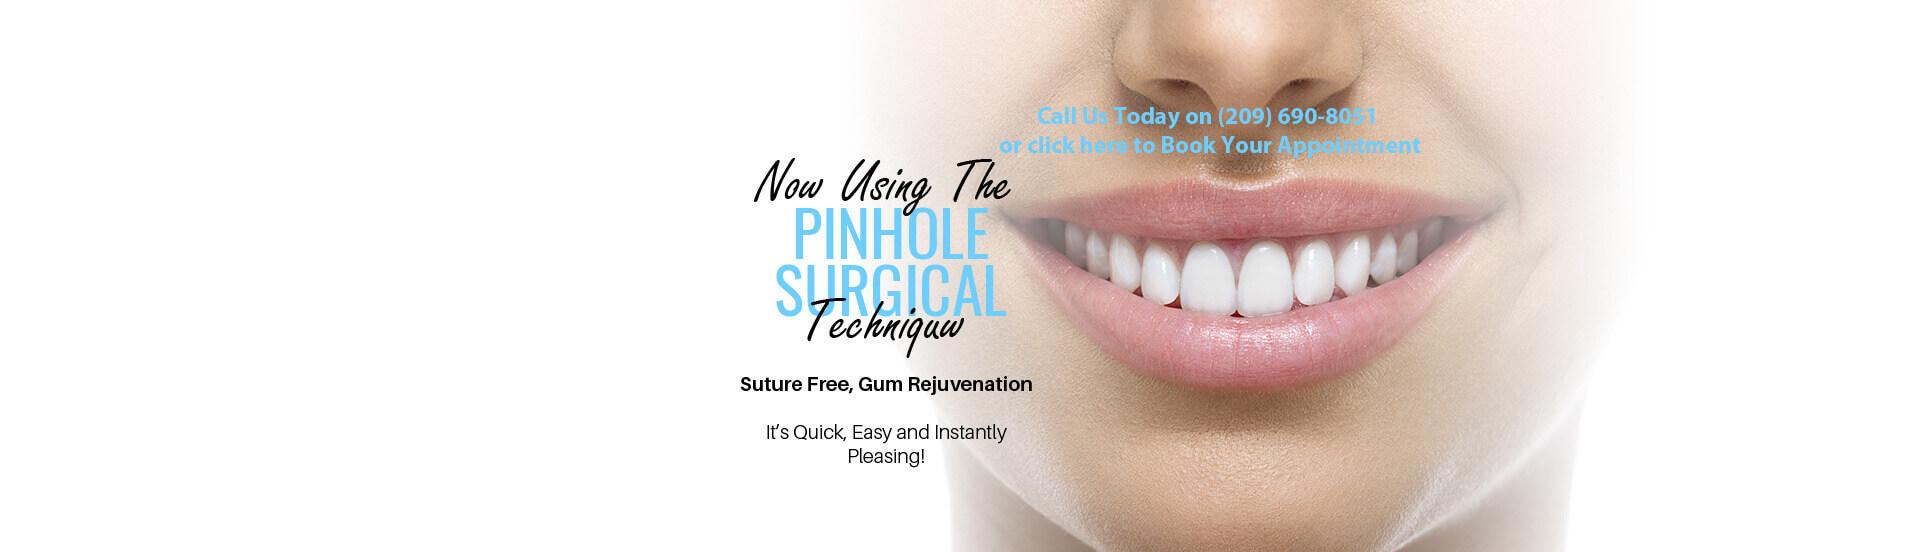 Dentist Turlock - Pinhole Surgical